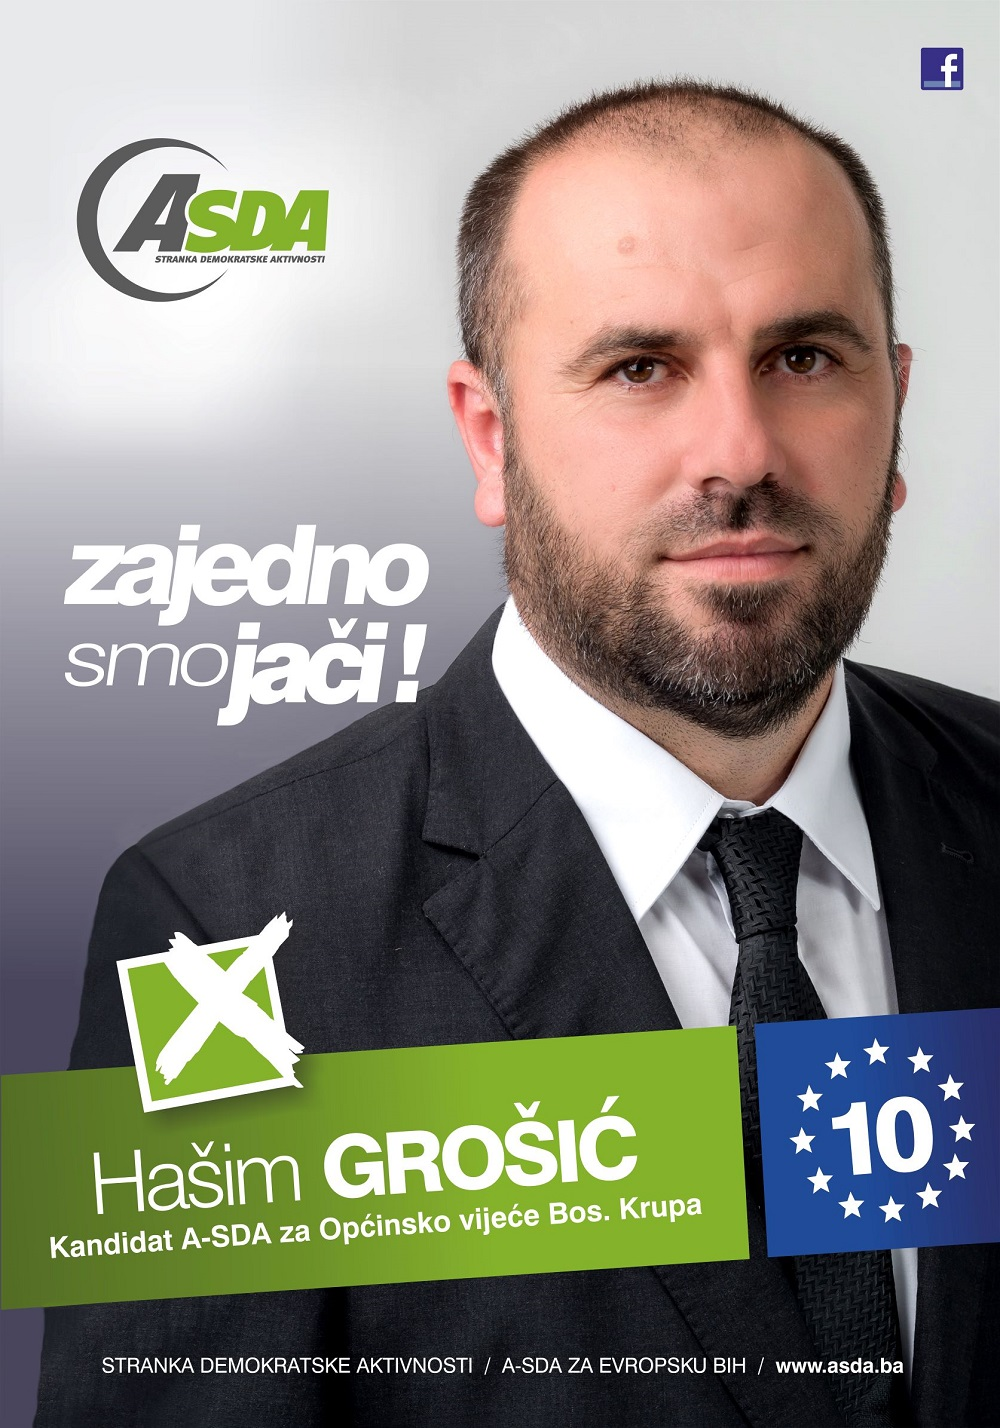 Hašim Grošić